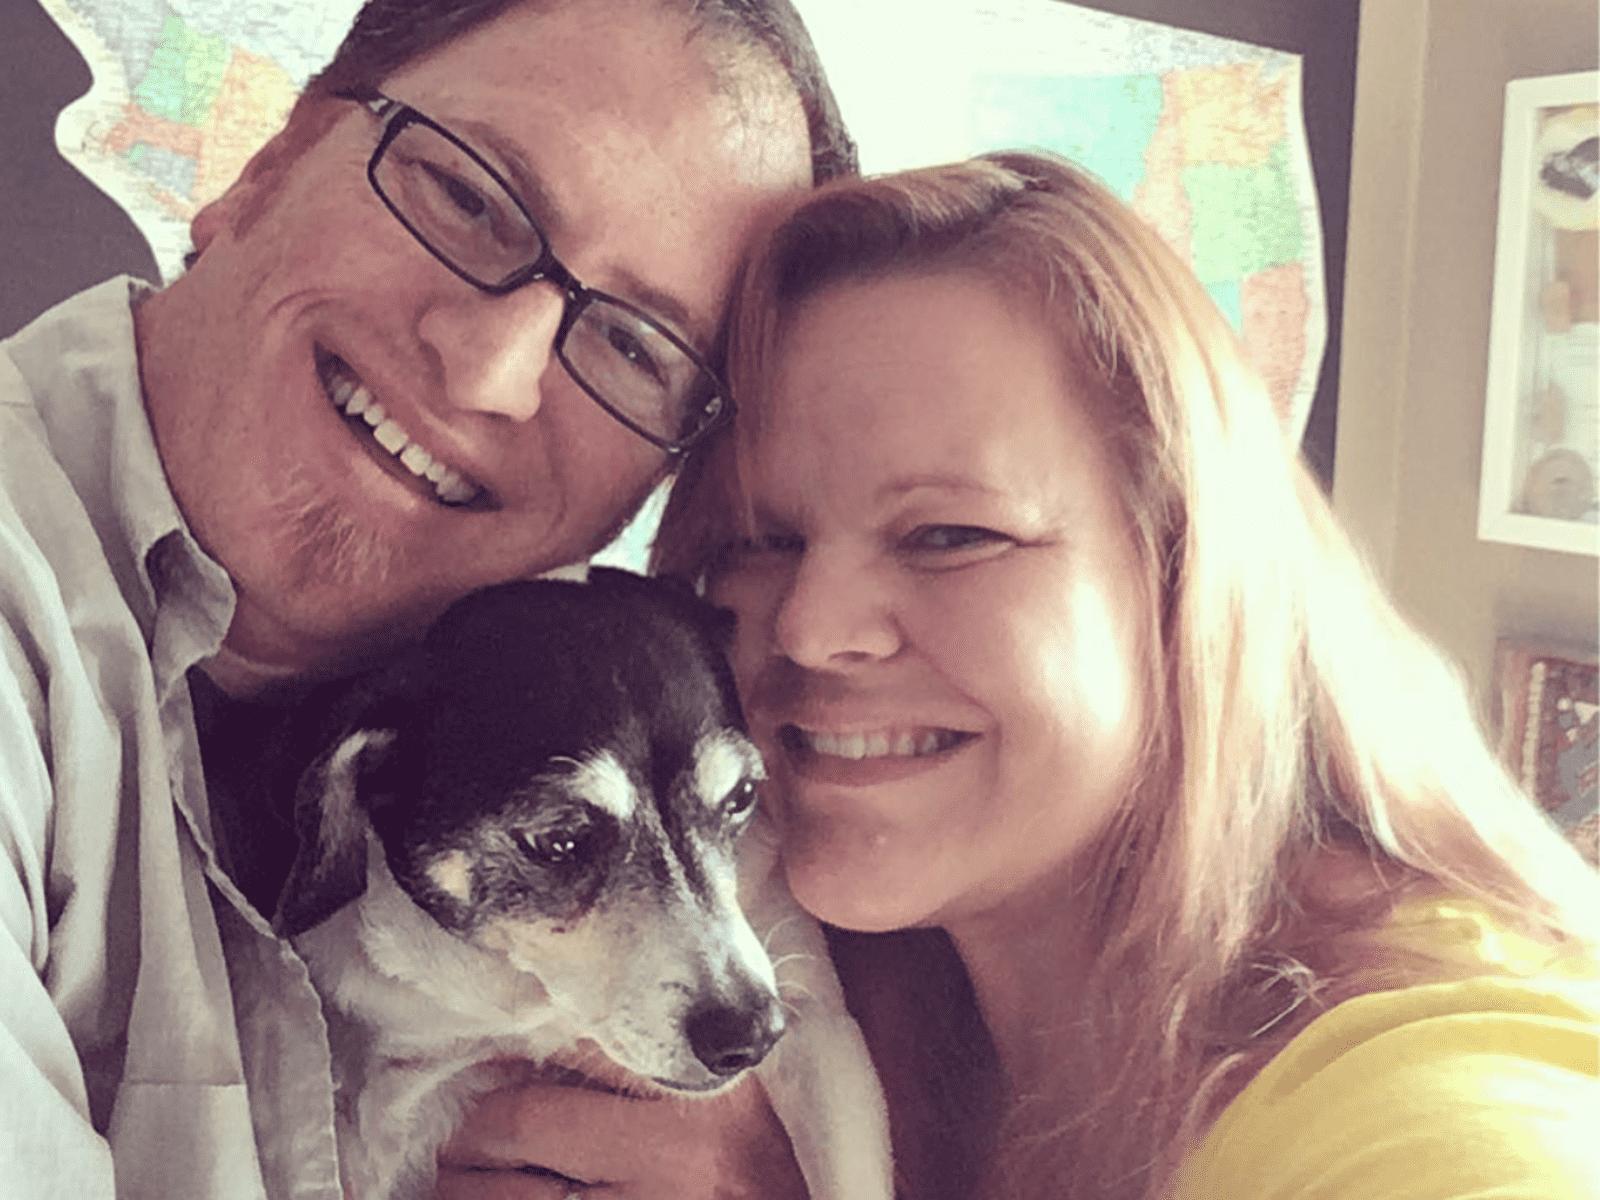 Jenna & Craig from Burbank, California, United States